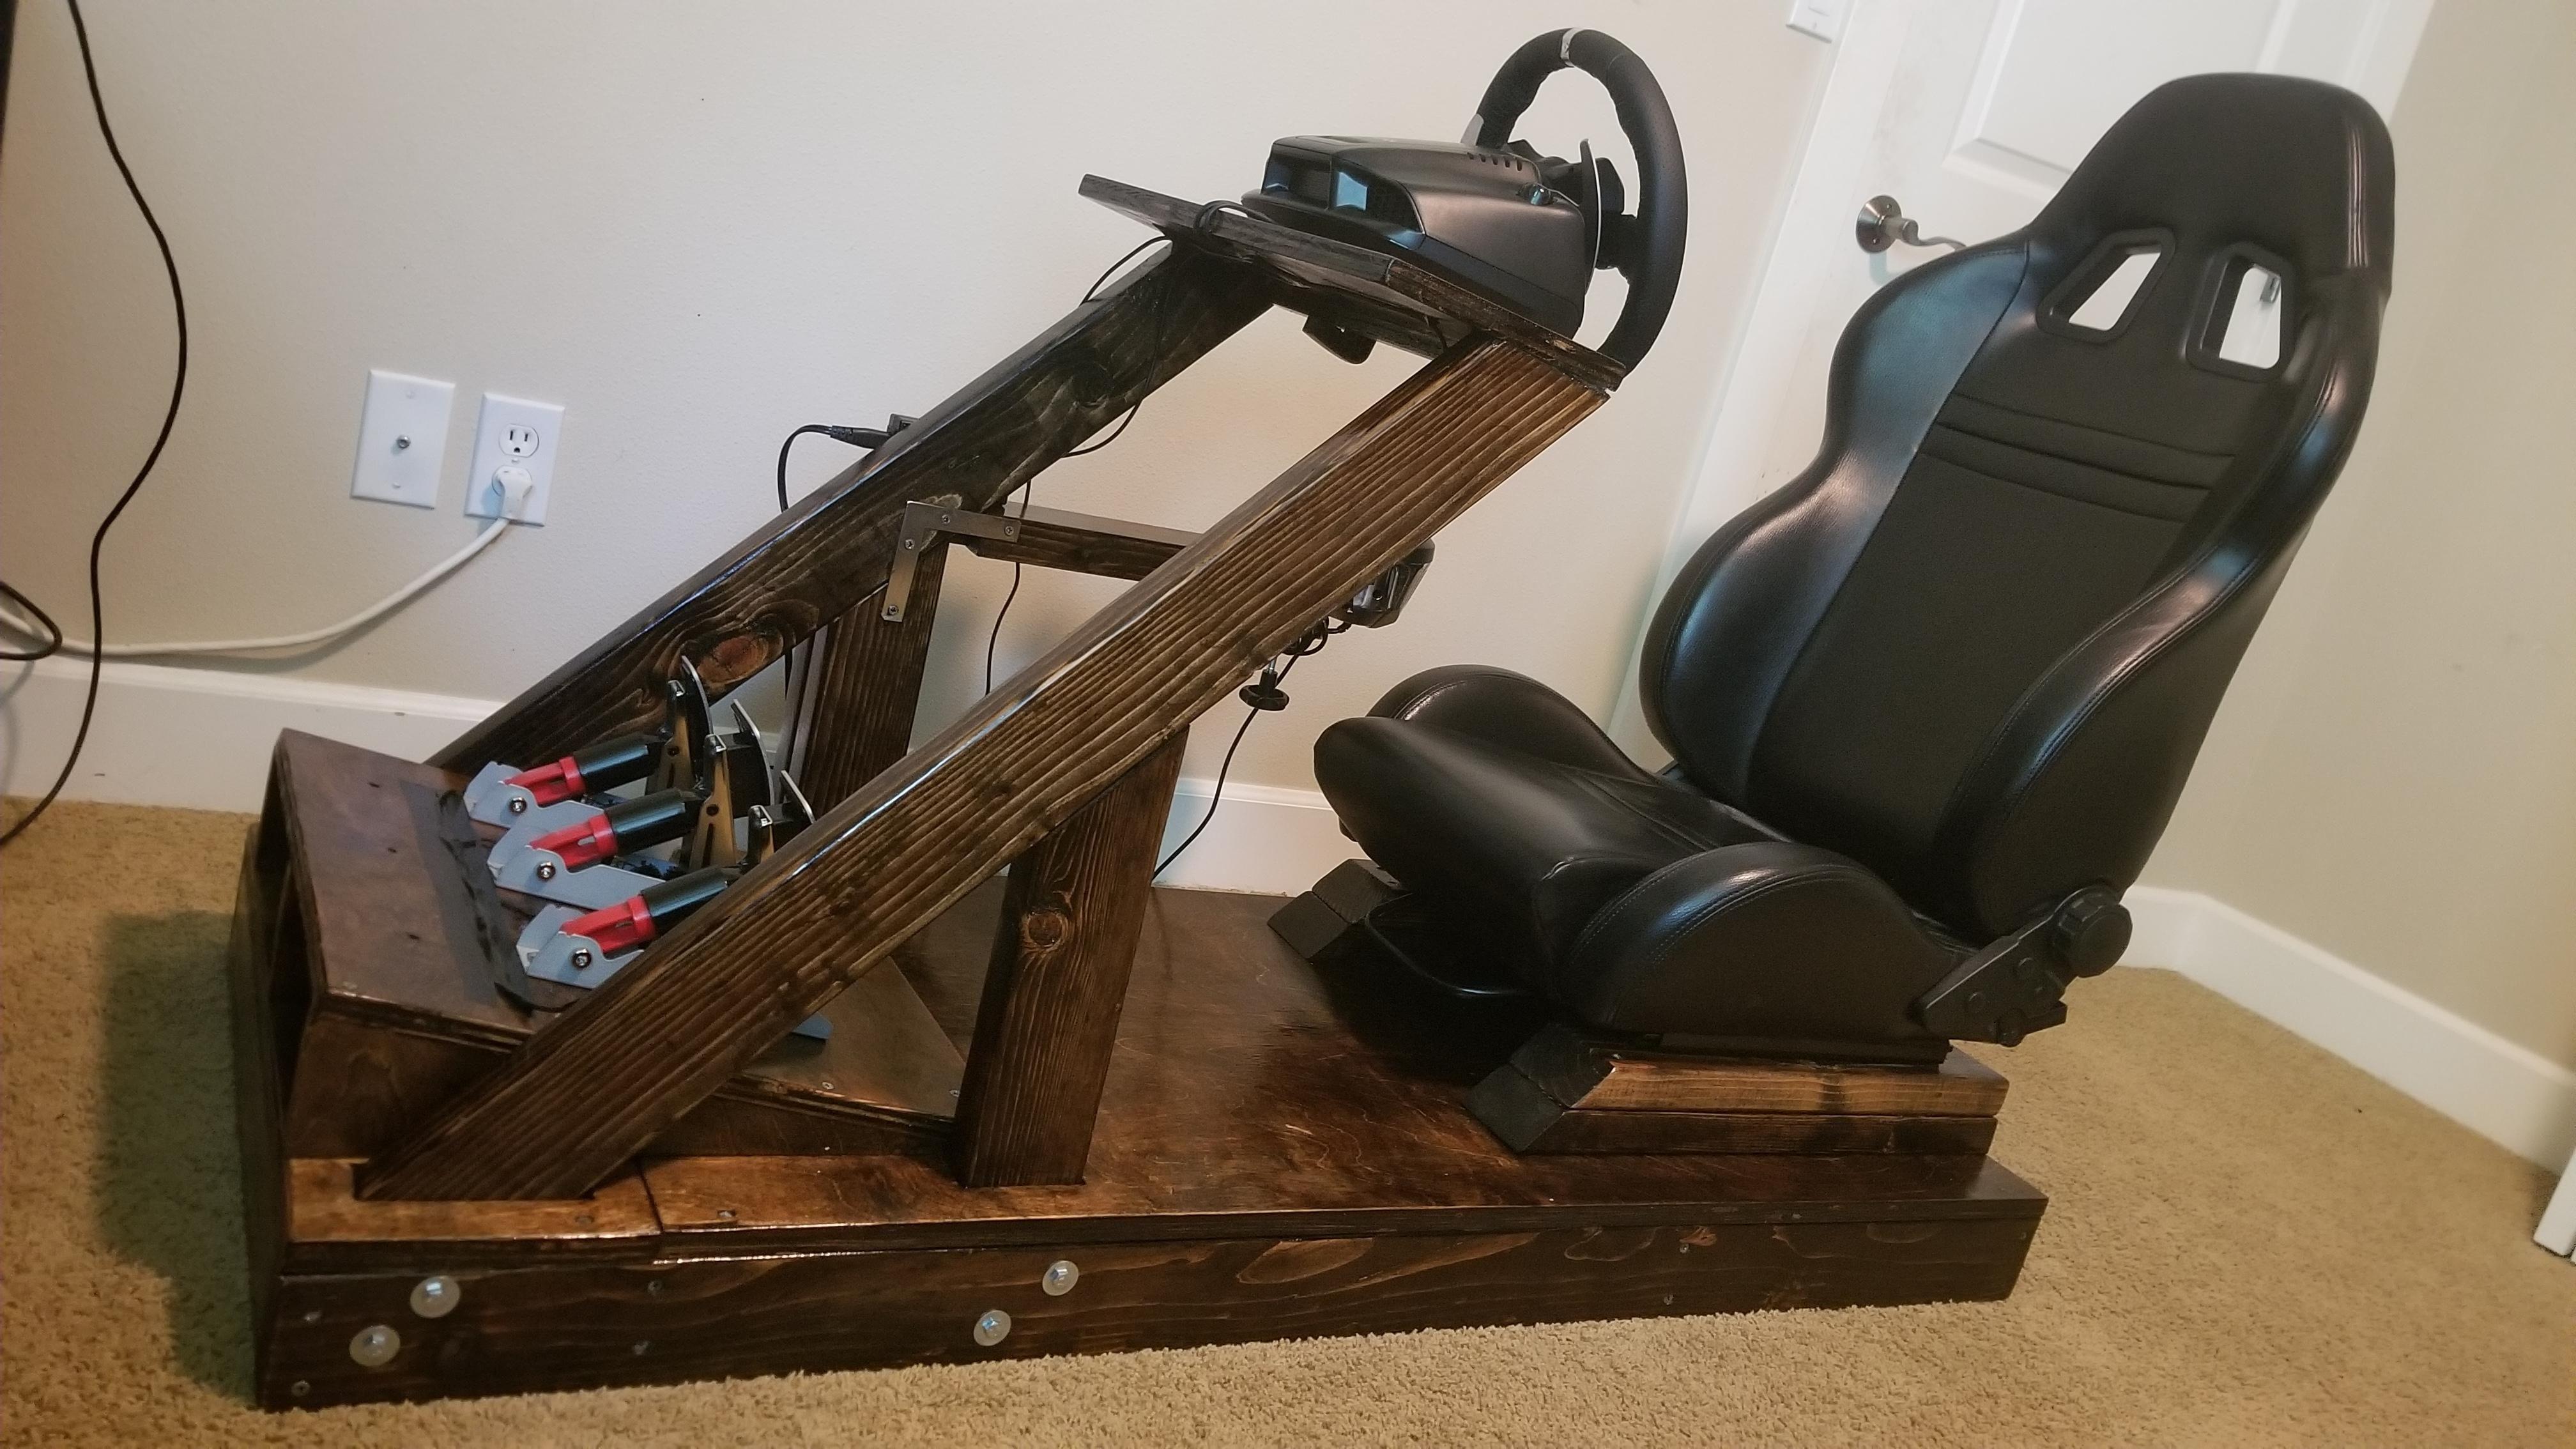 First big project DIY Sim Racing Setup! Built by a